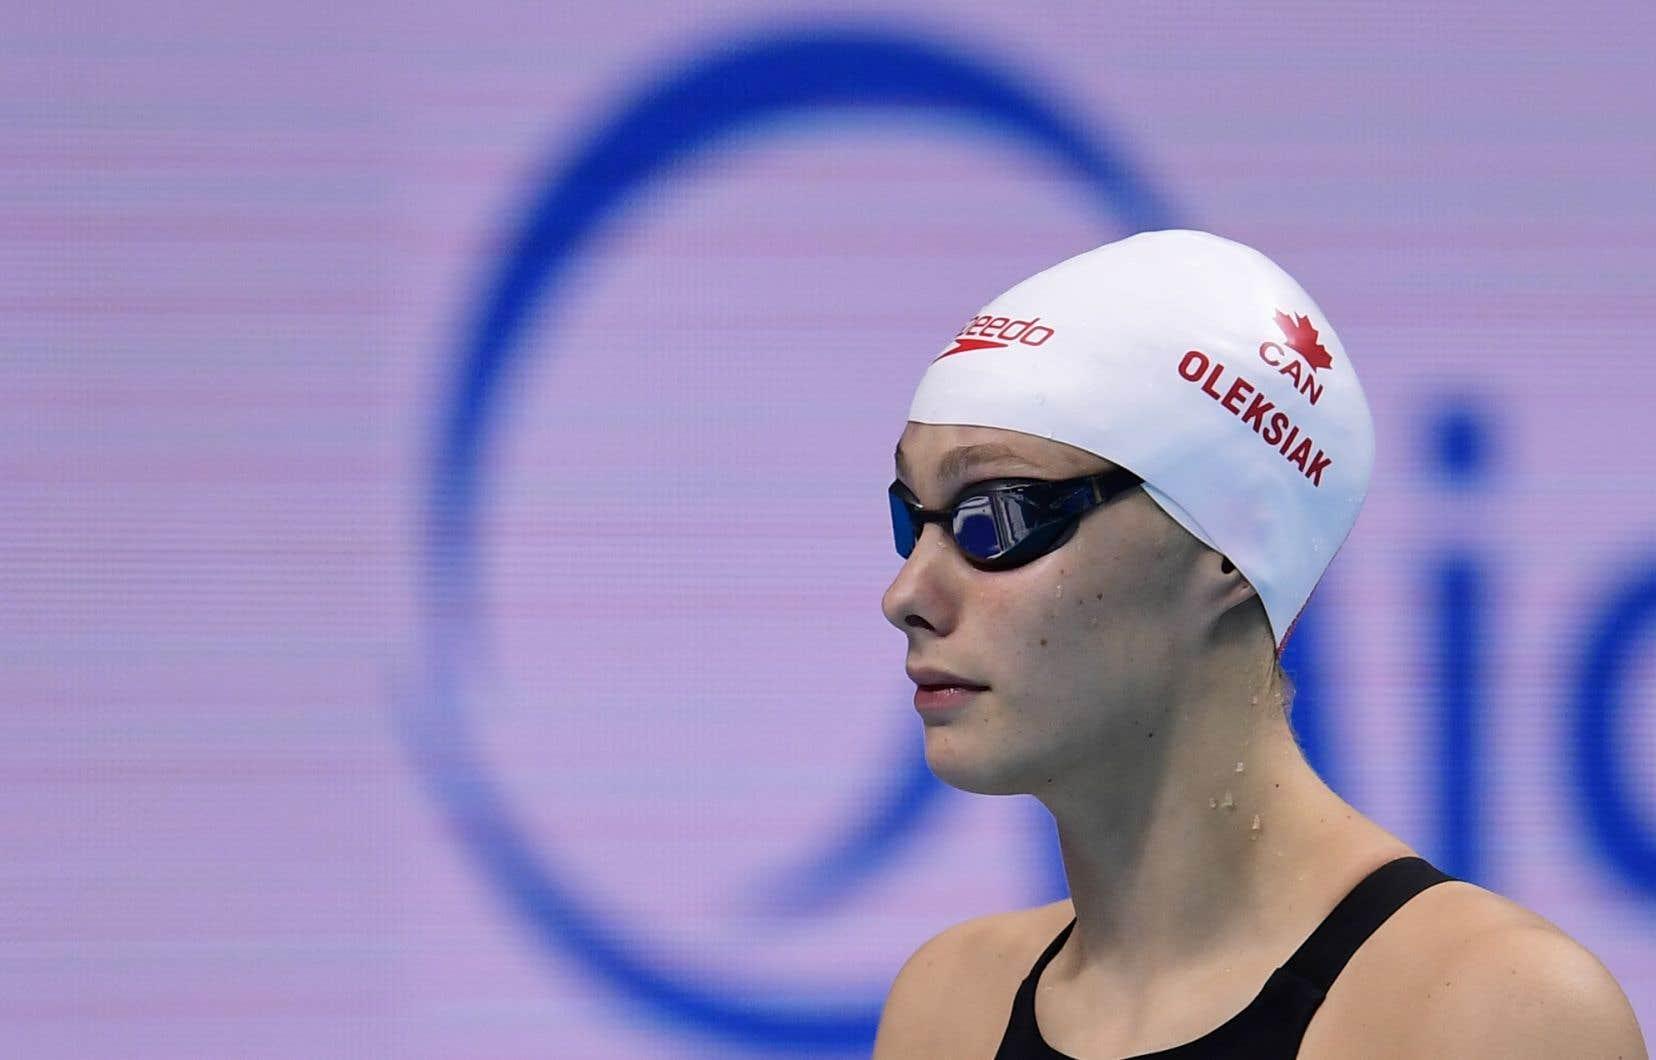 La championne olympique Penny Oleksiak